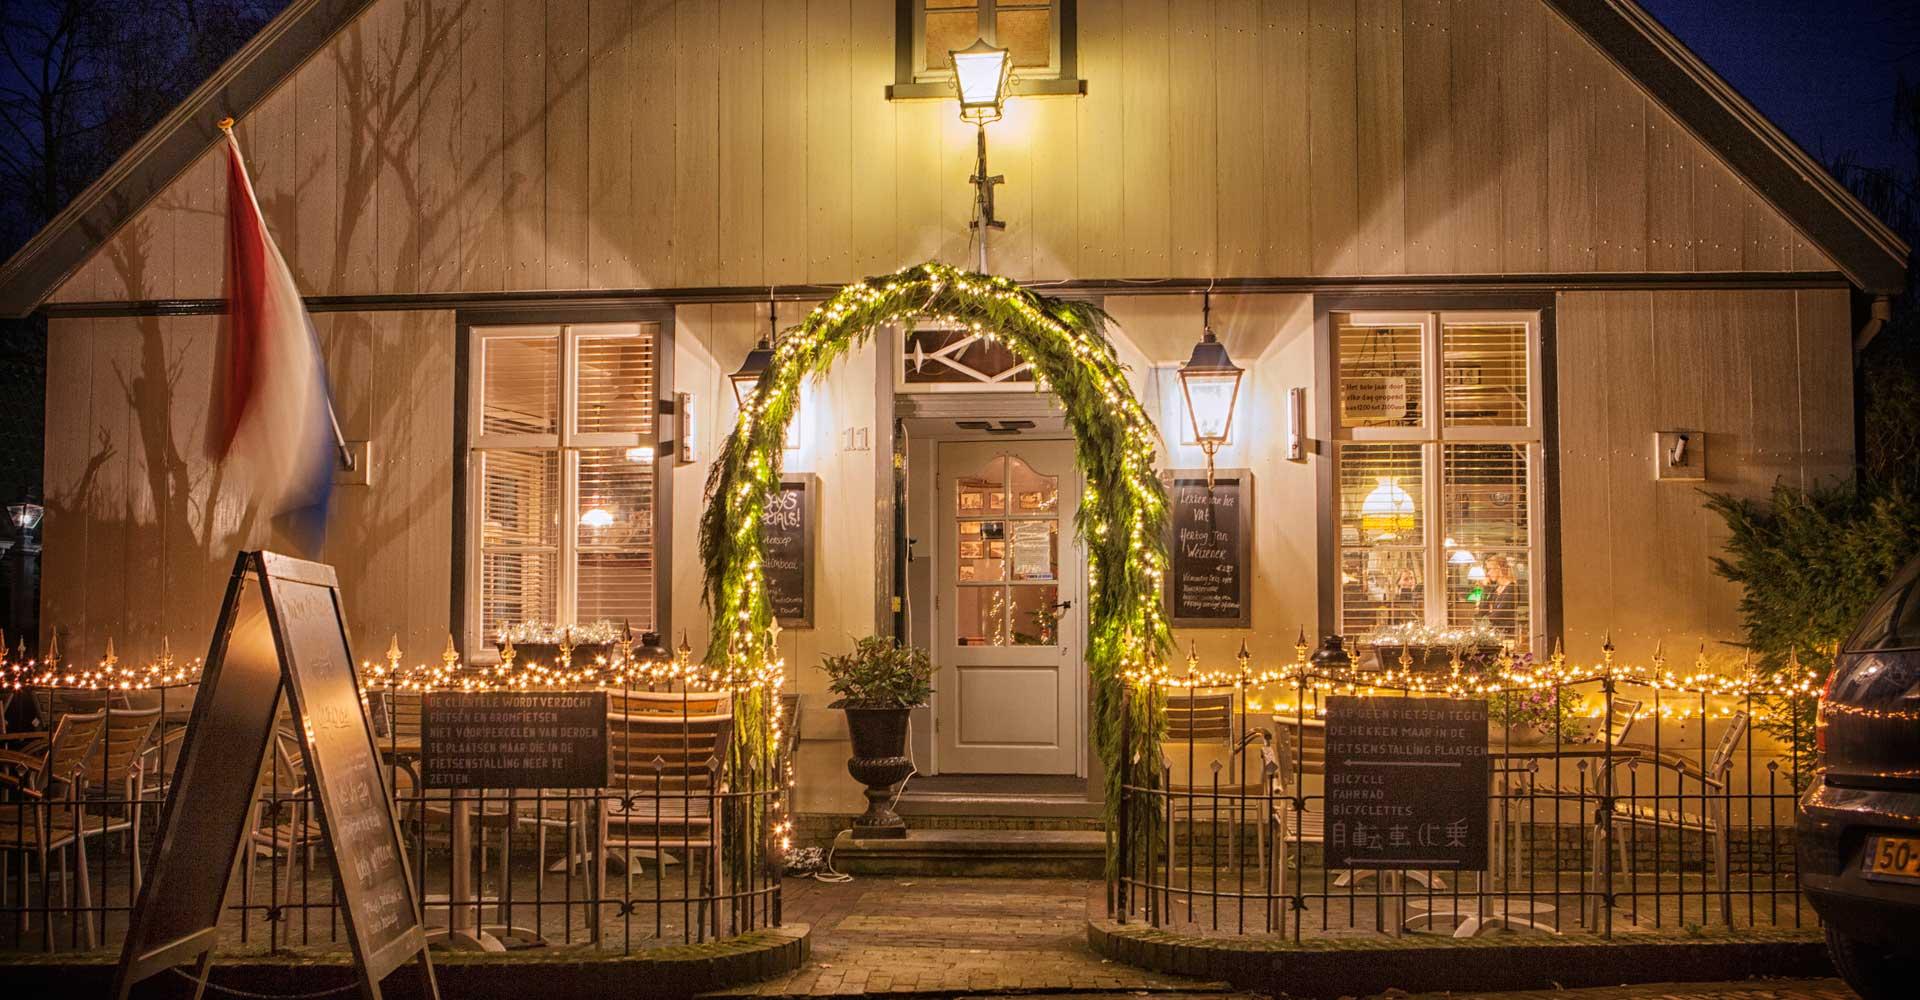 kindvriendelijk restaurant Noord Holland kerst